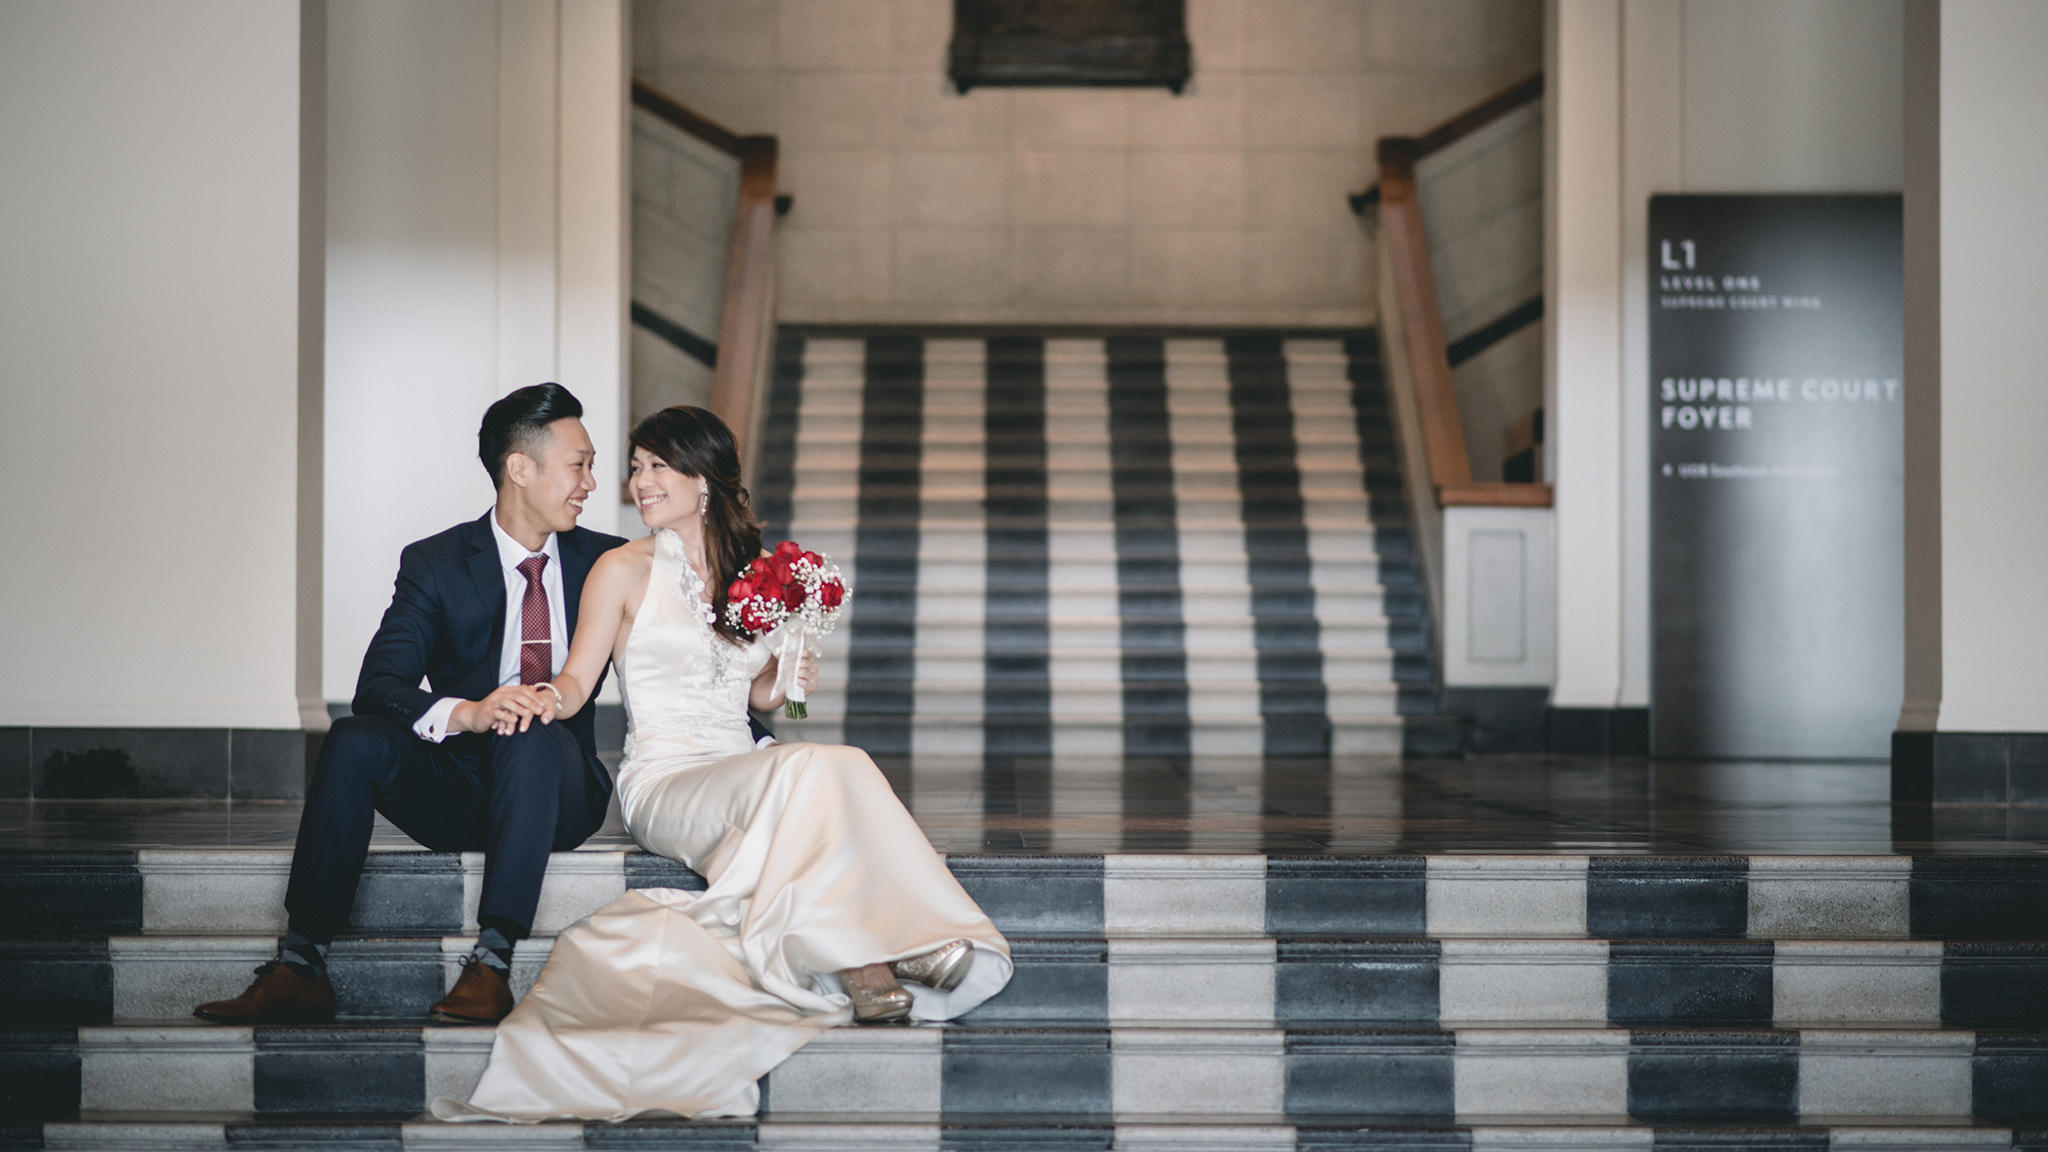 Wedding National Gallery 25.JPG